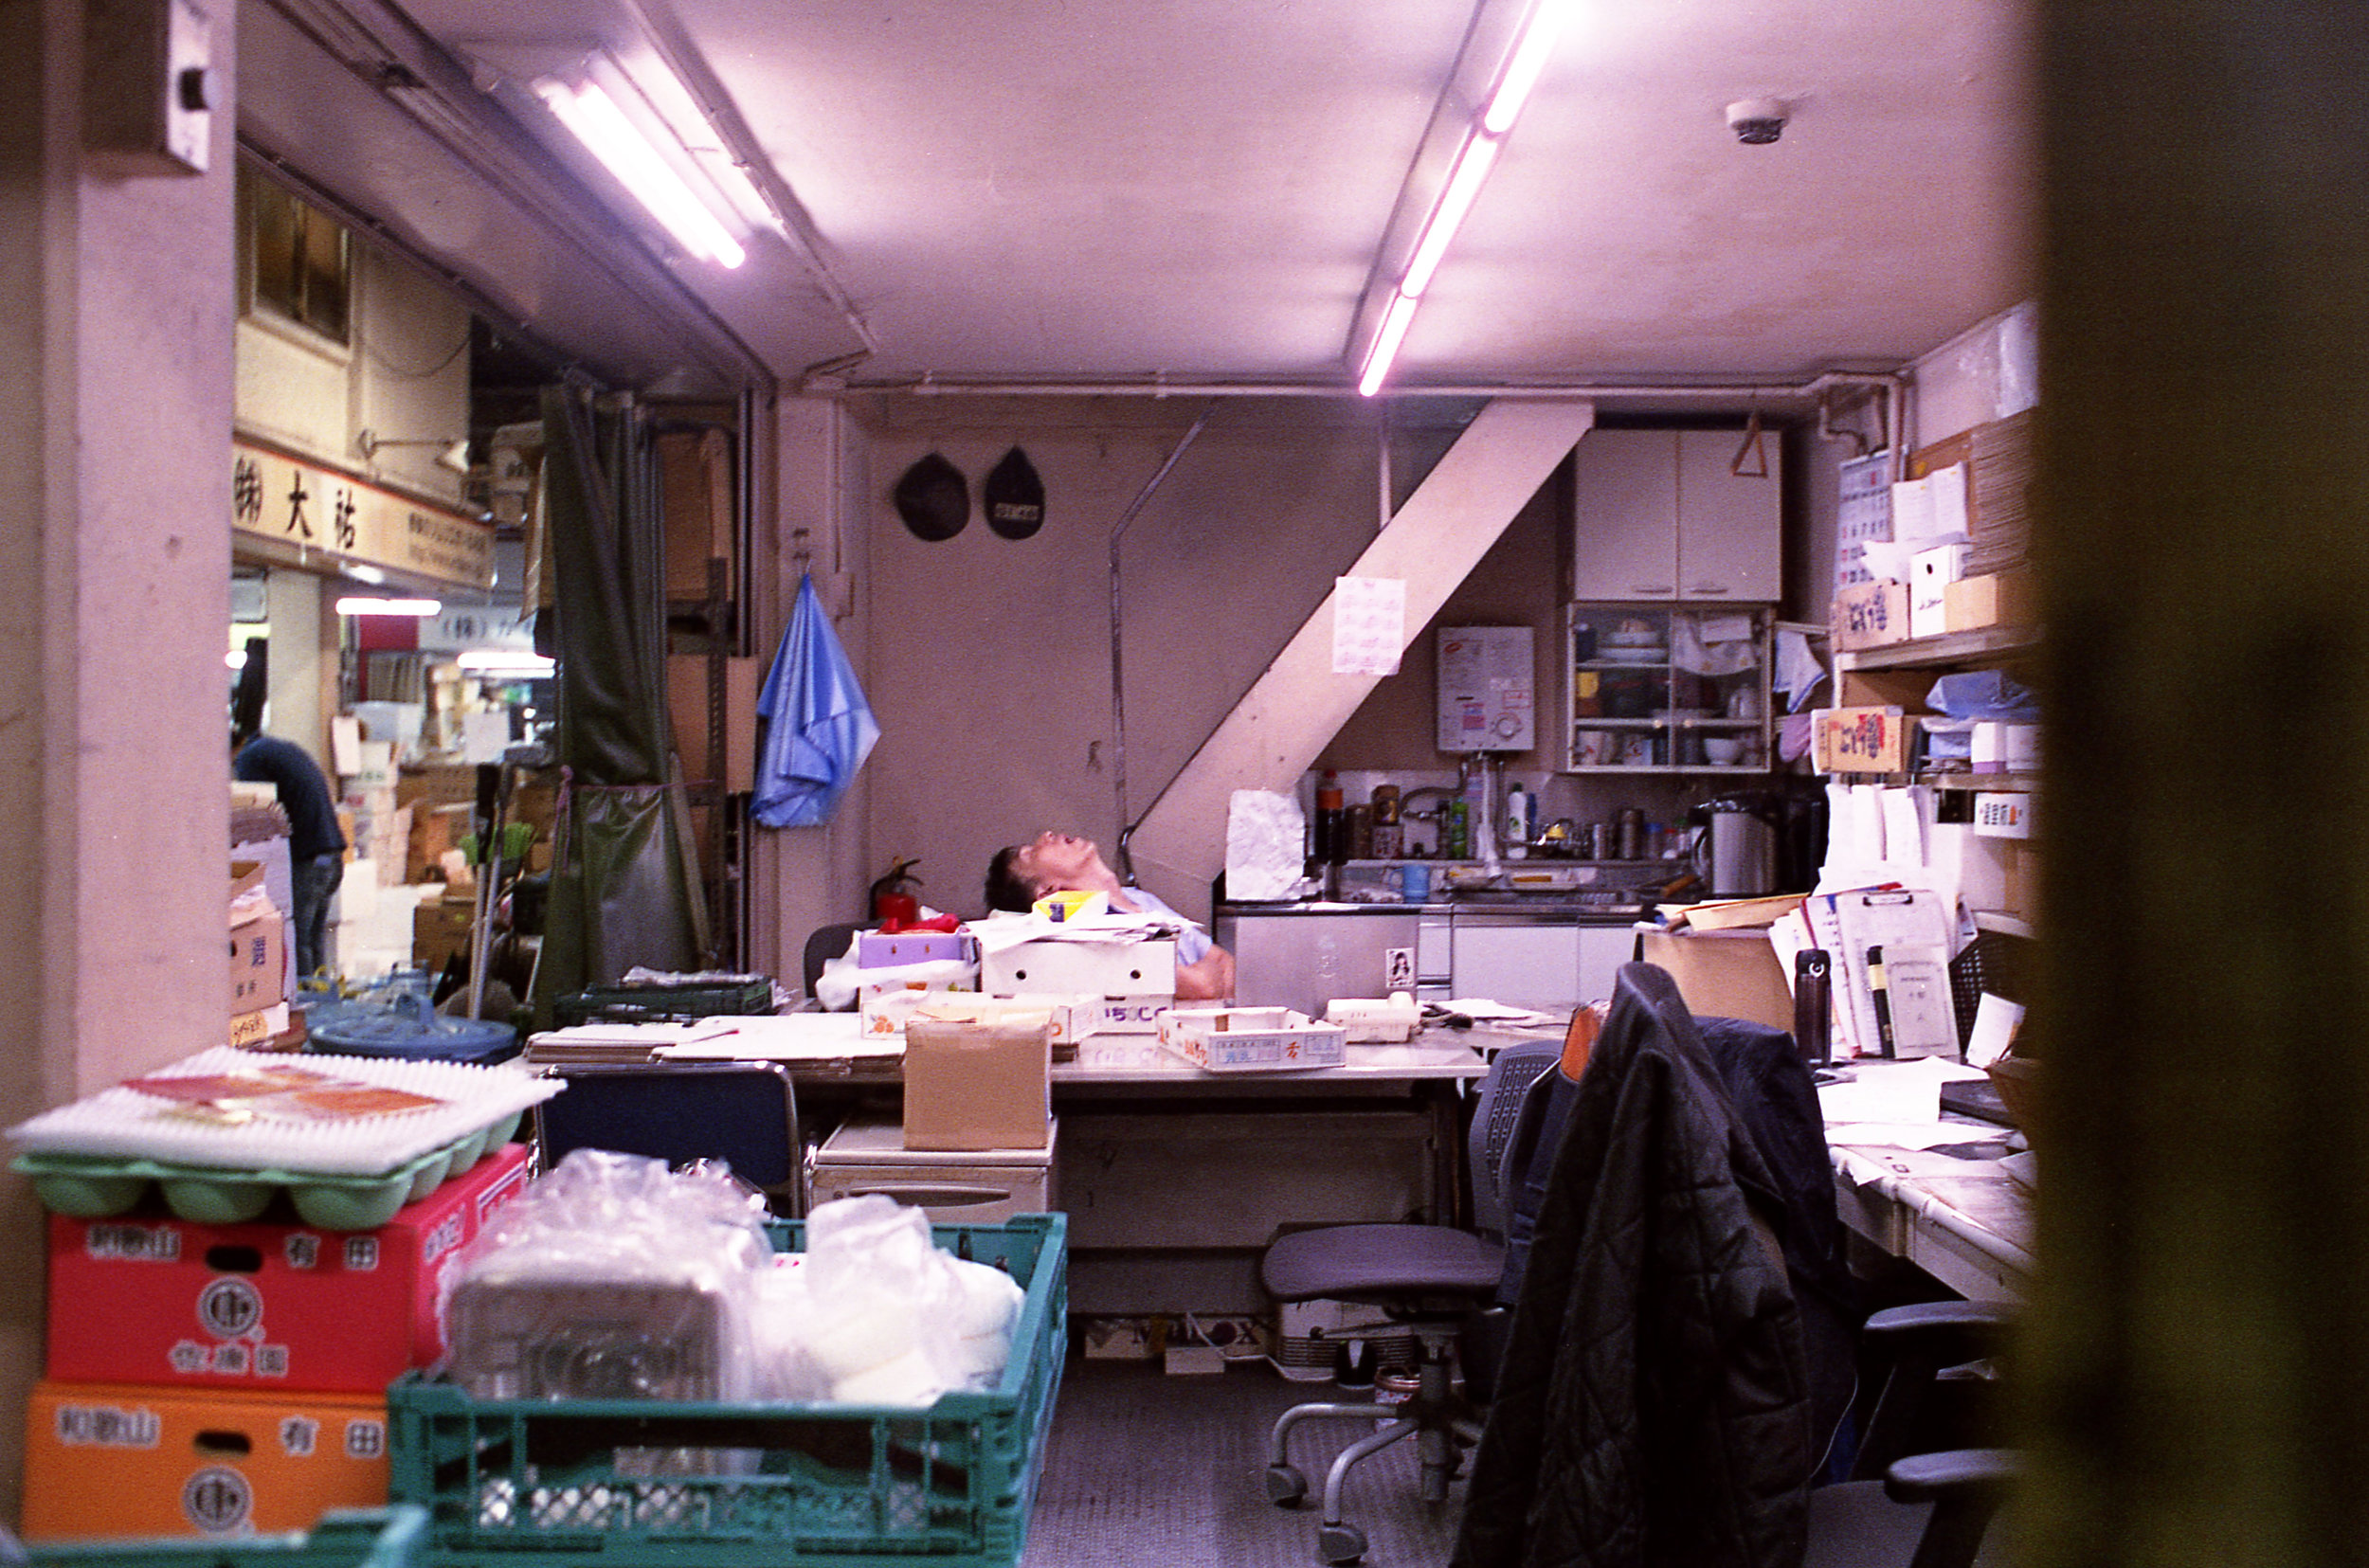 20180830_TsukijiMarket_029.jpg